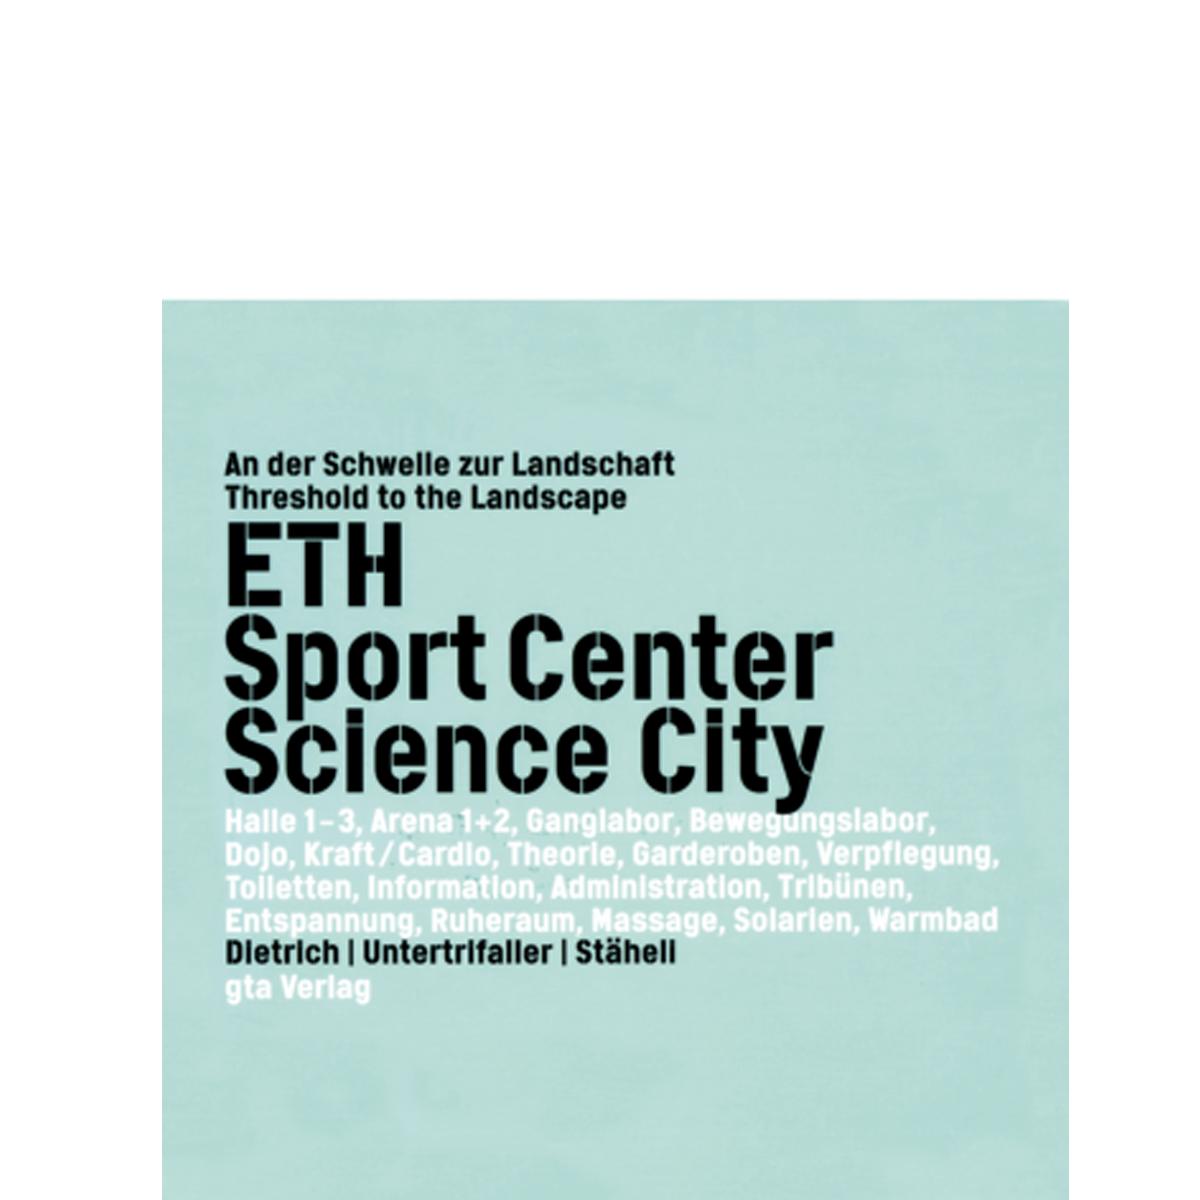 ETH Sport Center Science City